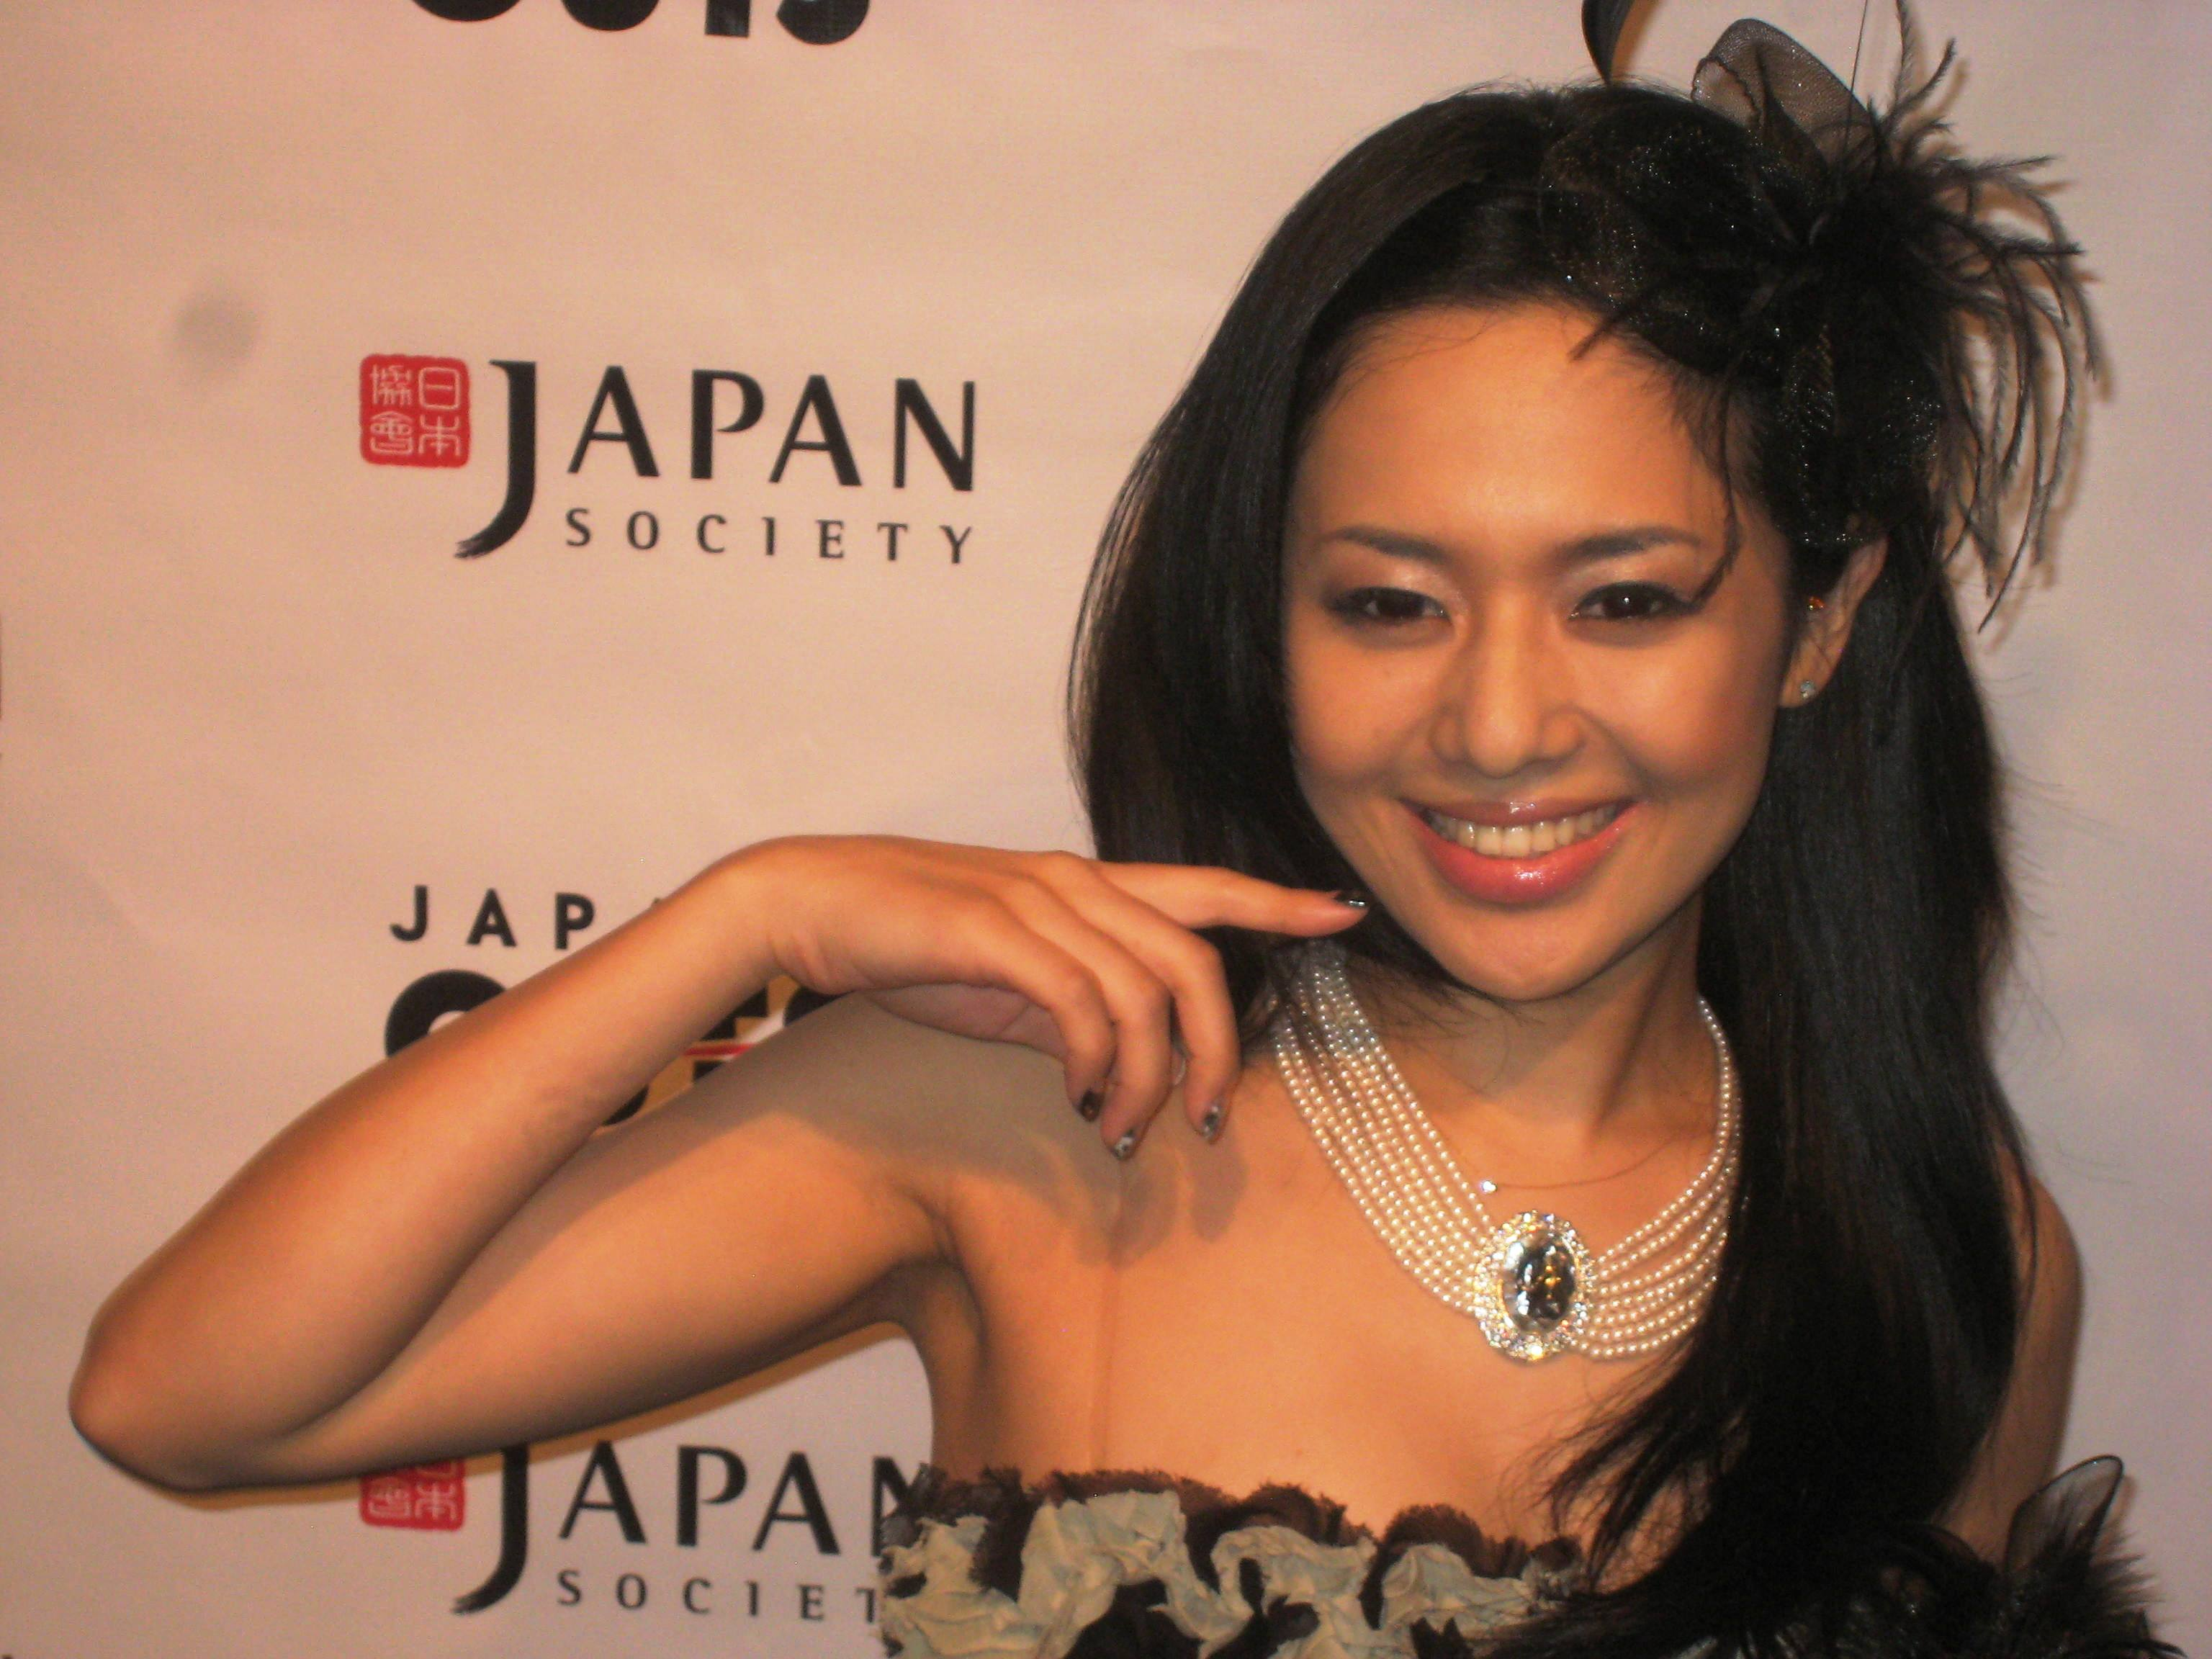 Jessica parker kennedy titties